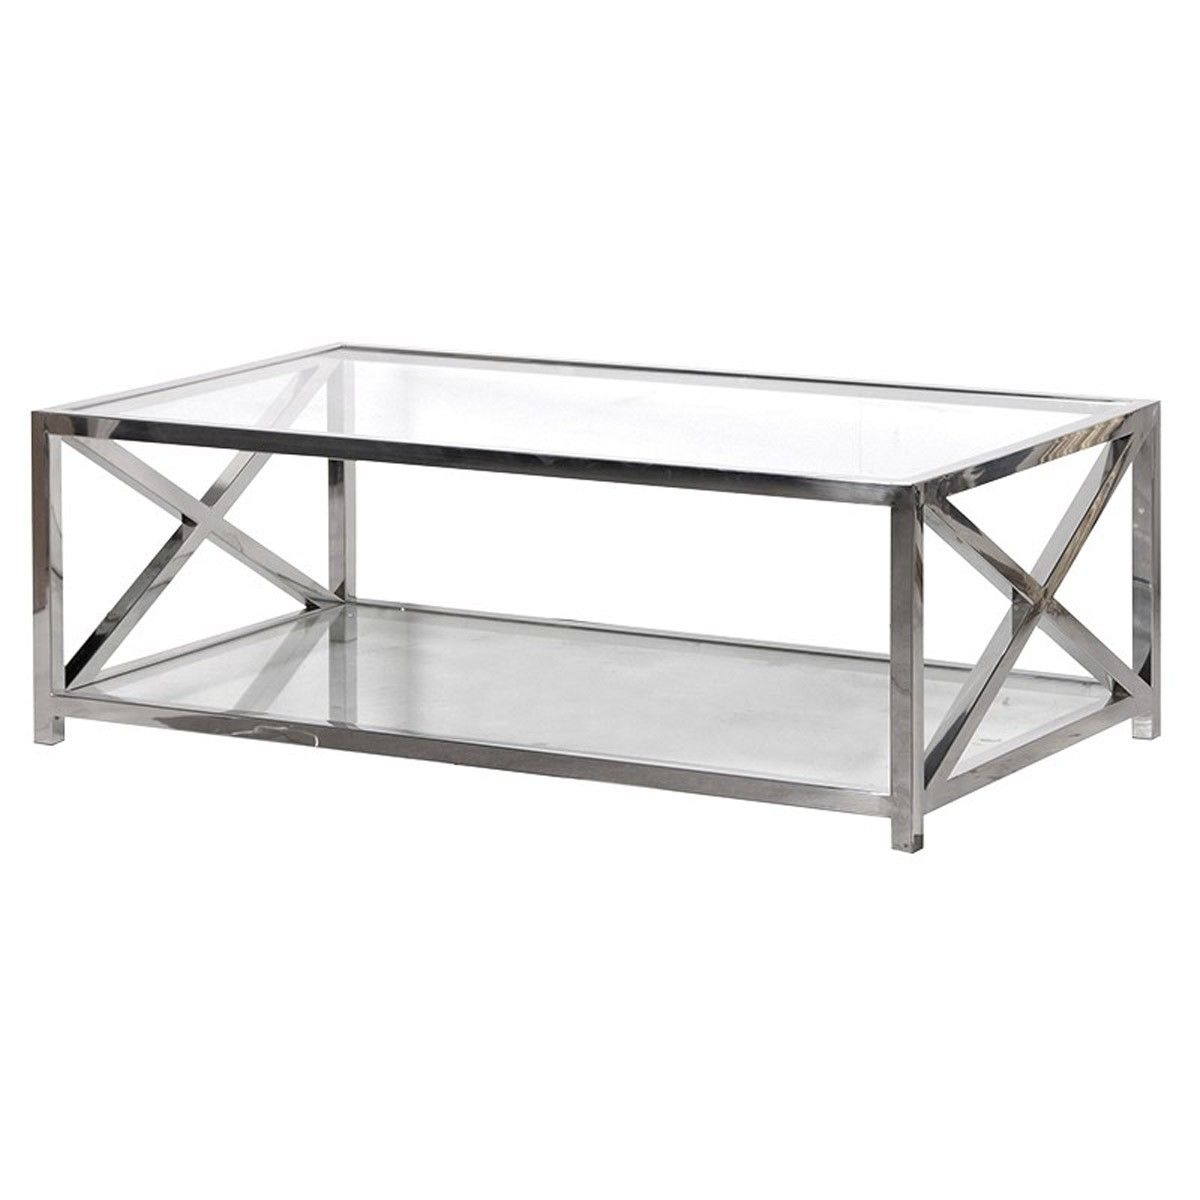 Acier Coffee Table Coffee Table X Frame Coffee Table Side Coffee Table [ 1200 x 1200 Pixel ]